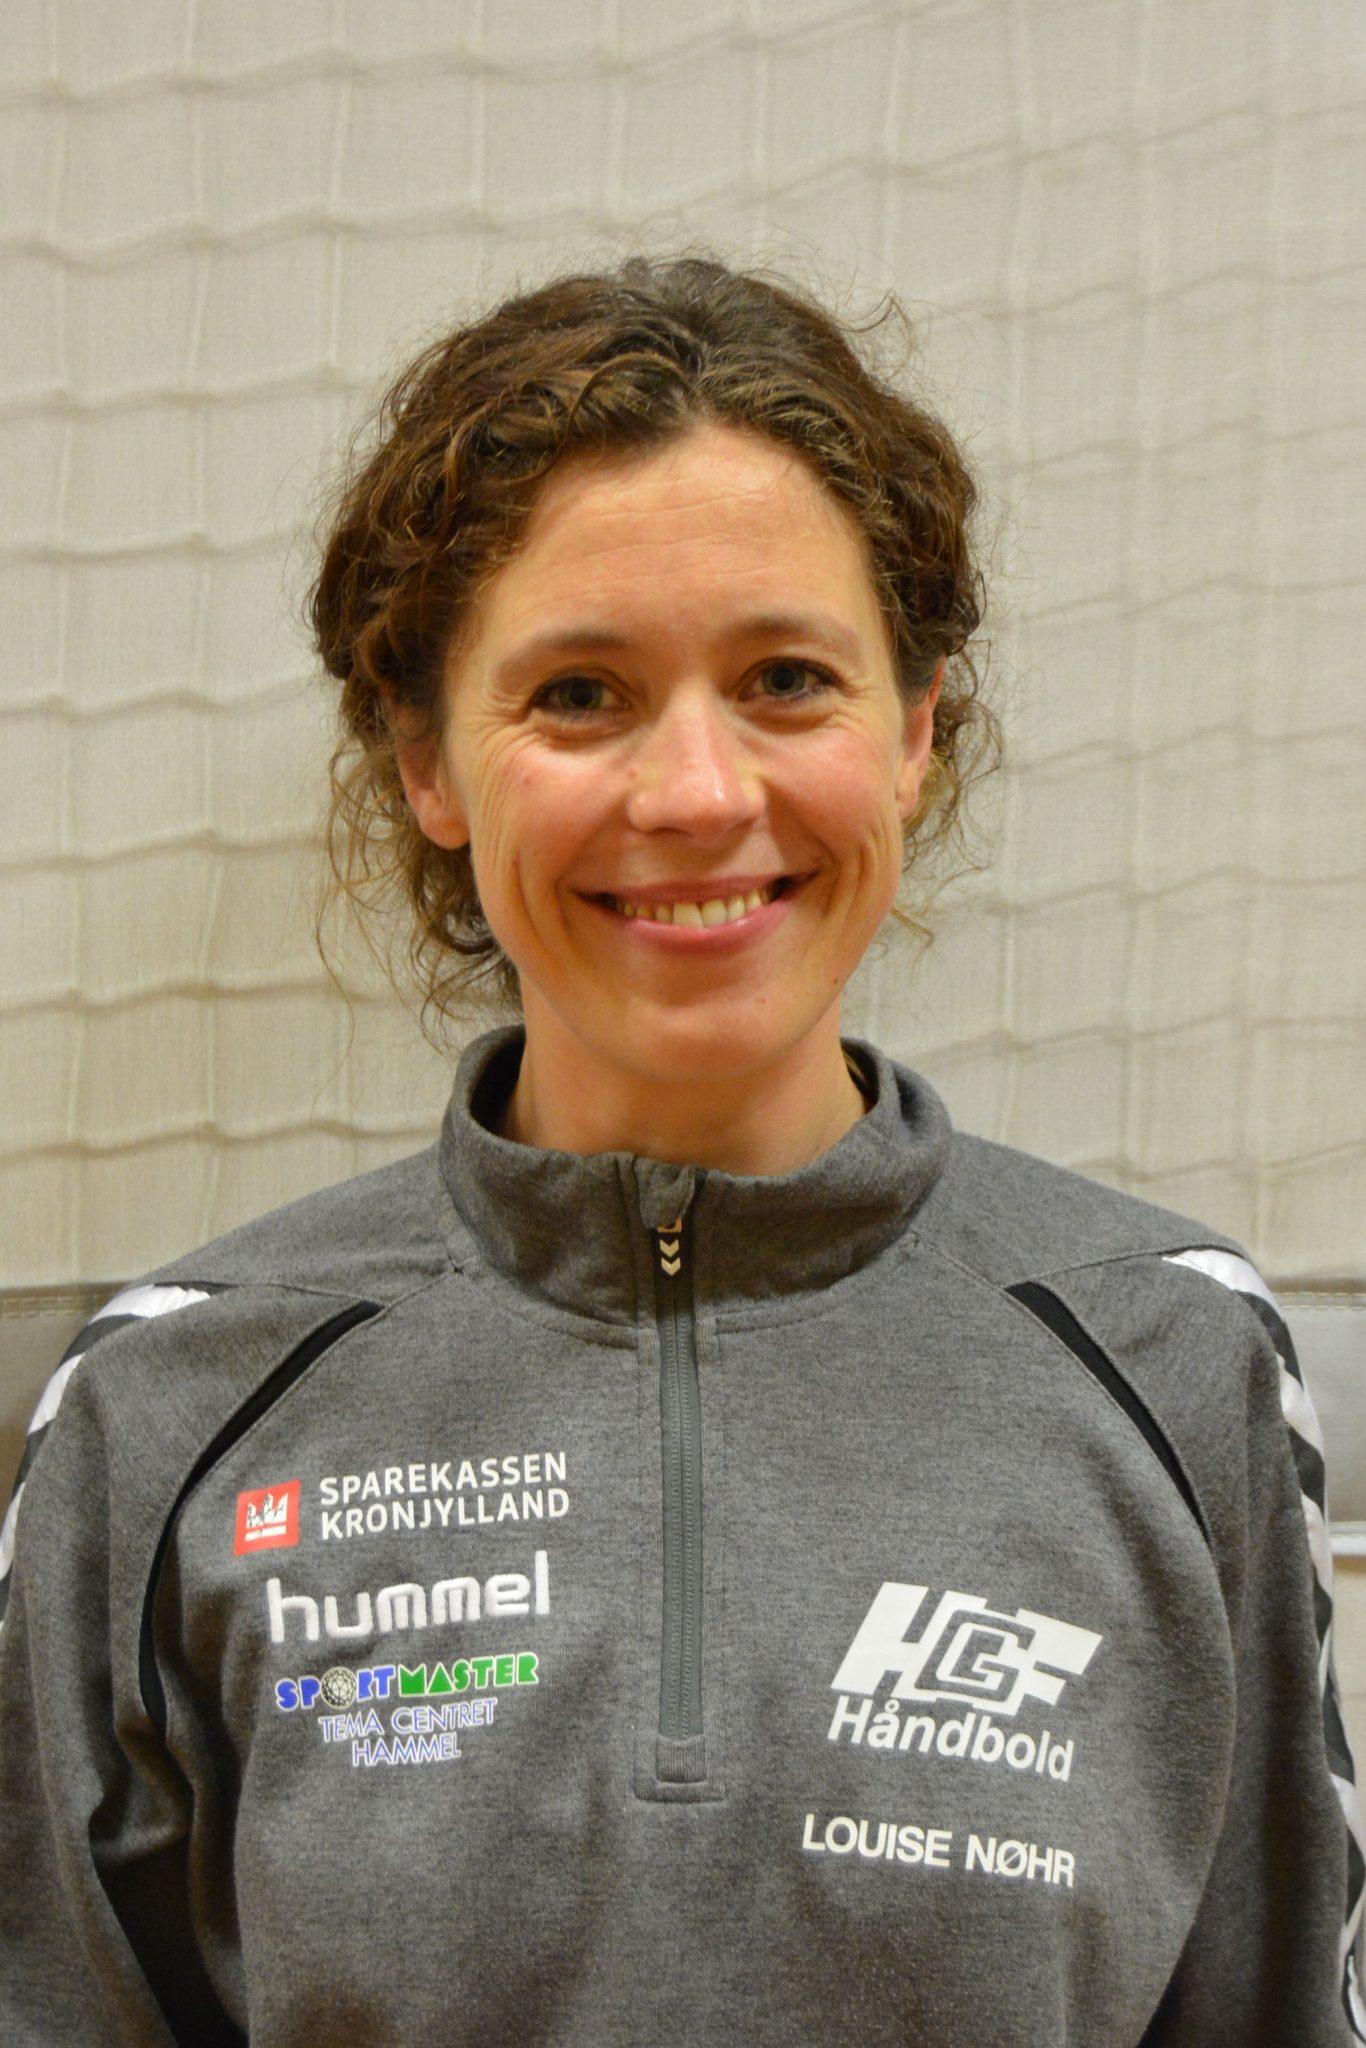 Louise Nørh